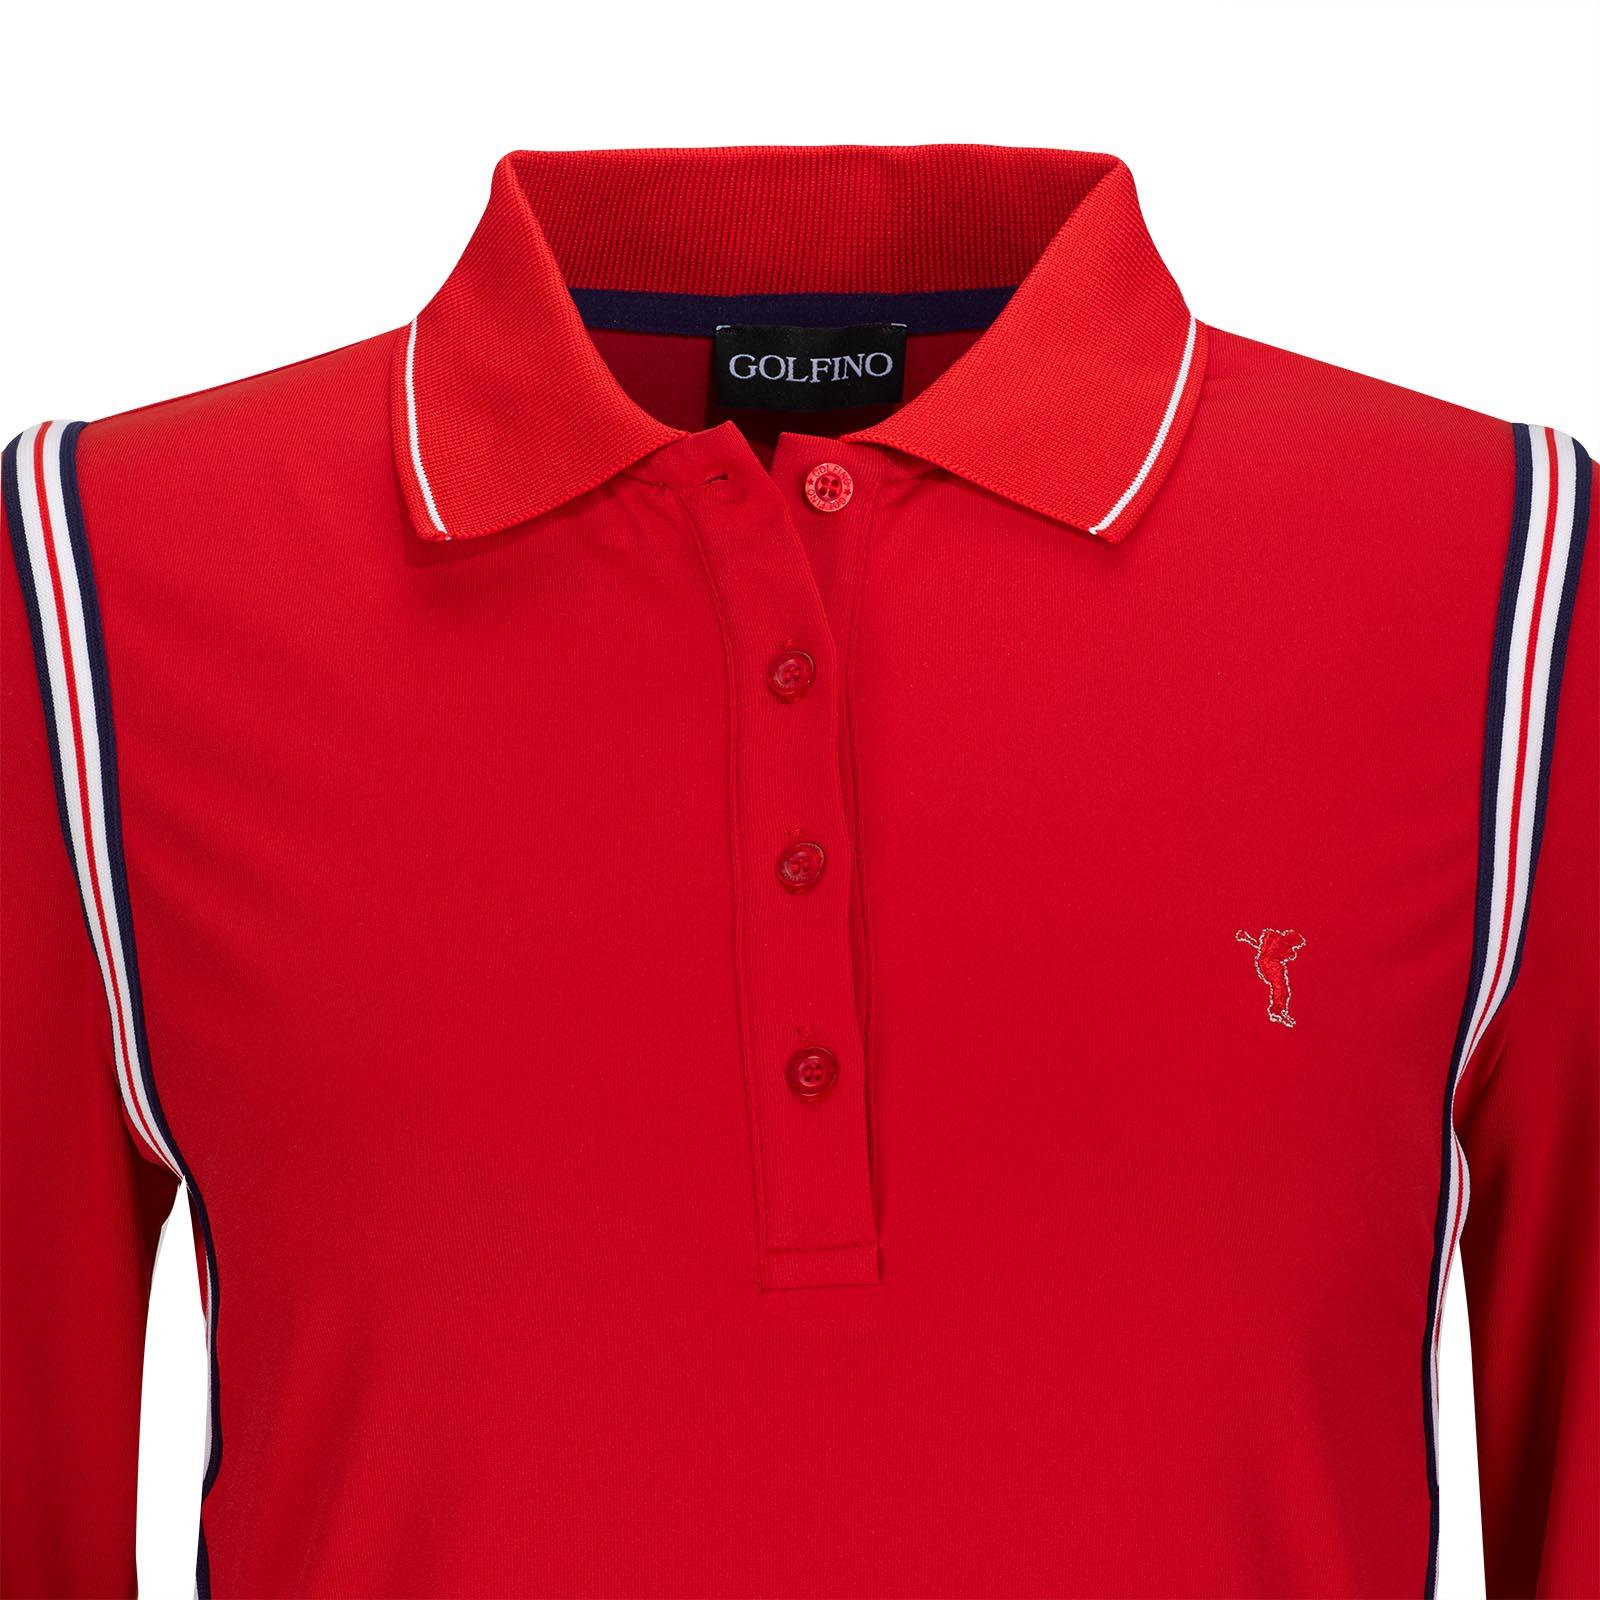 Damen Basic Langarm Funktions-Golfpolo mit Moisture Management